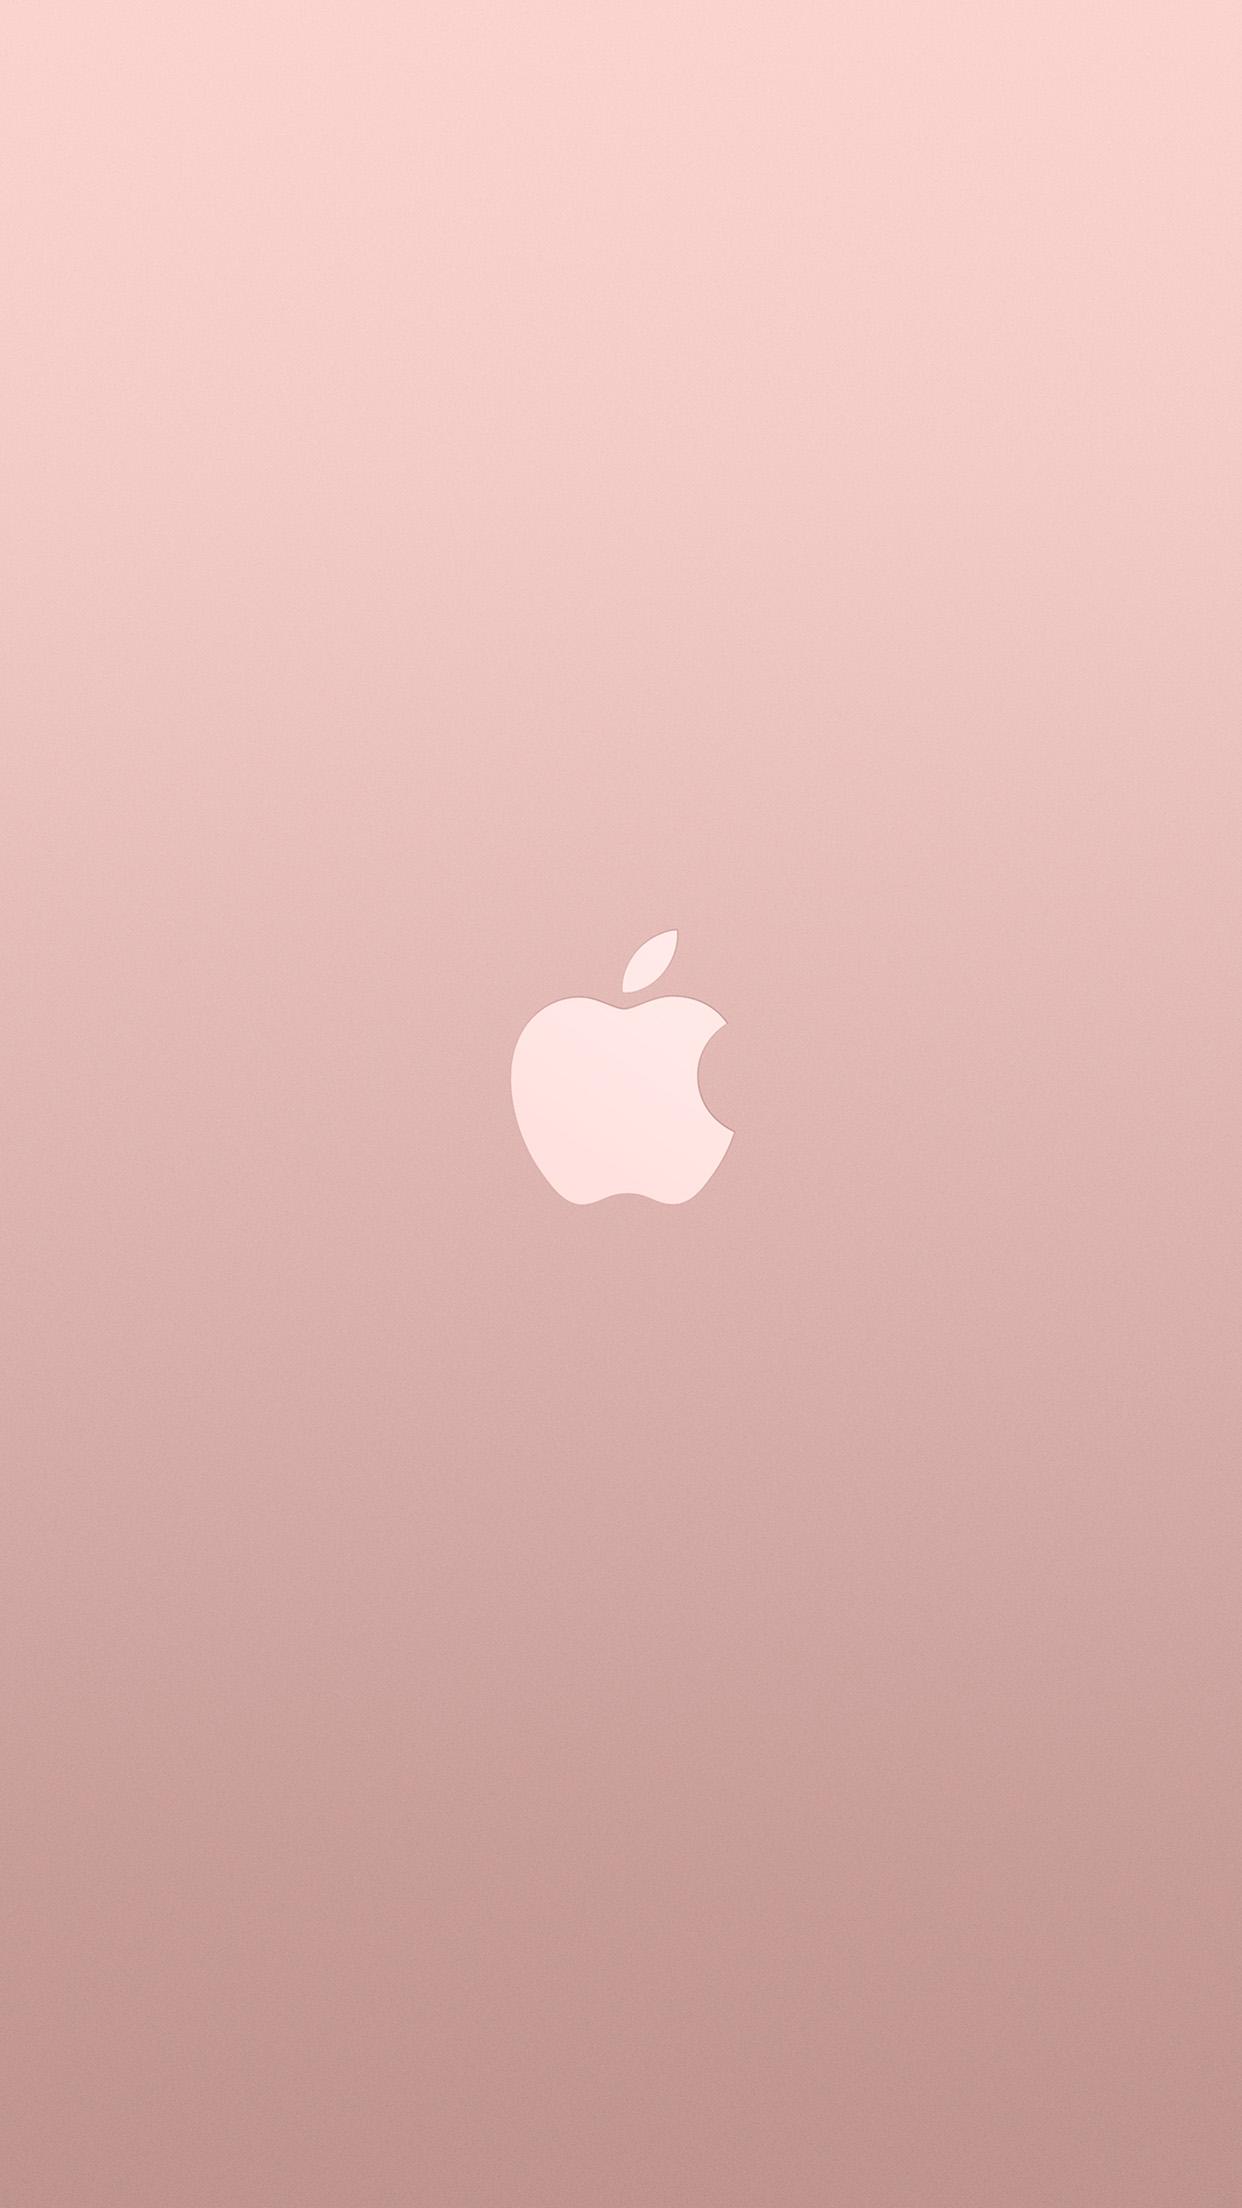 Logo Apple Pink Rose Gold White Minimal Illustration Art Android